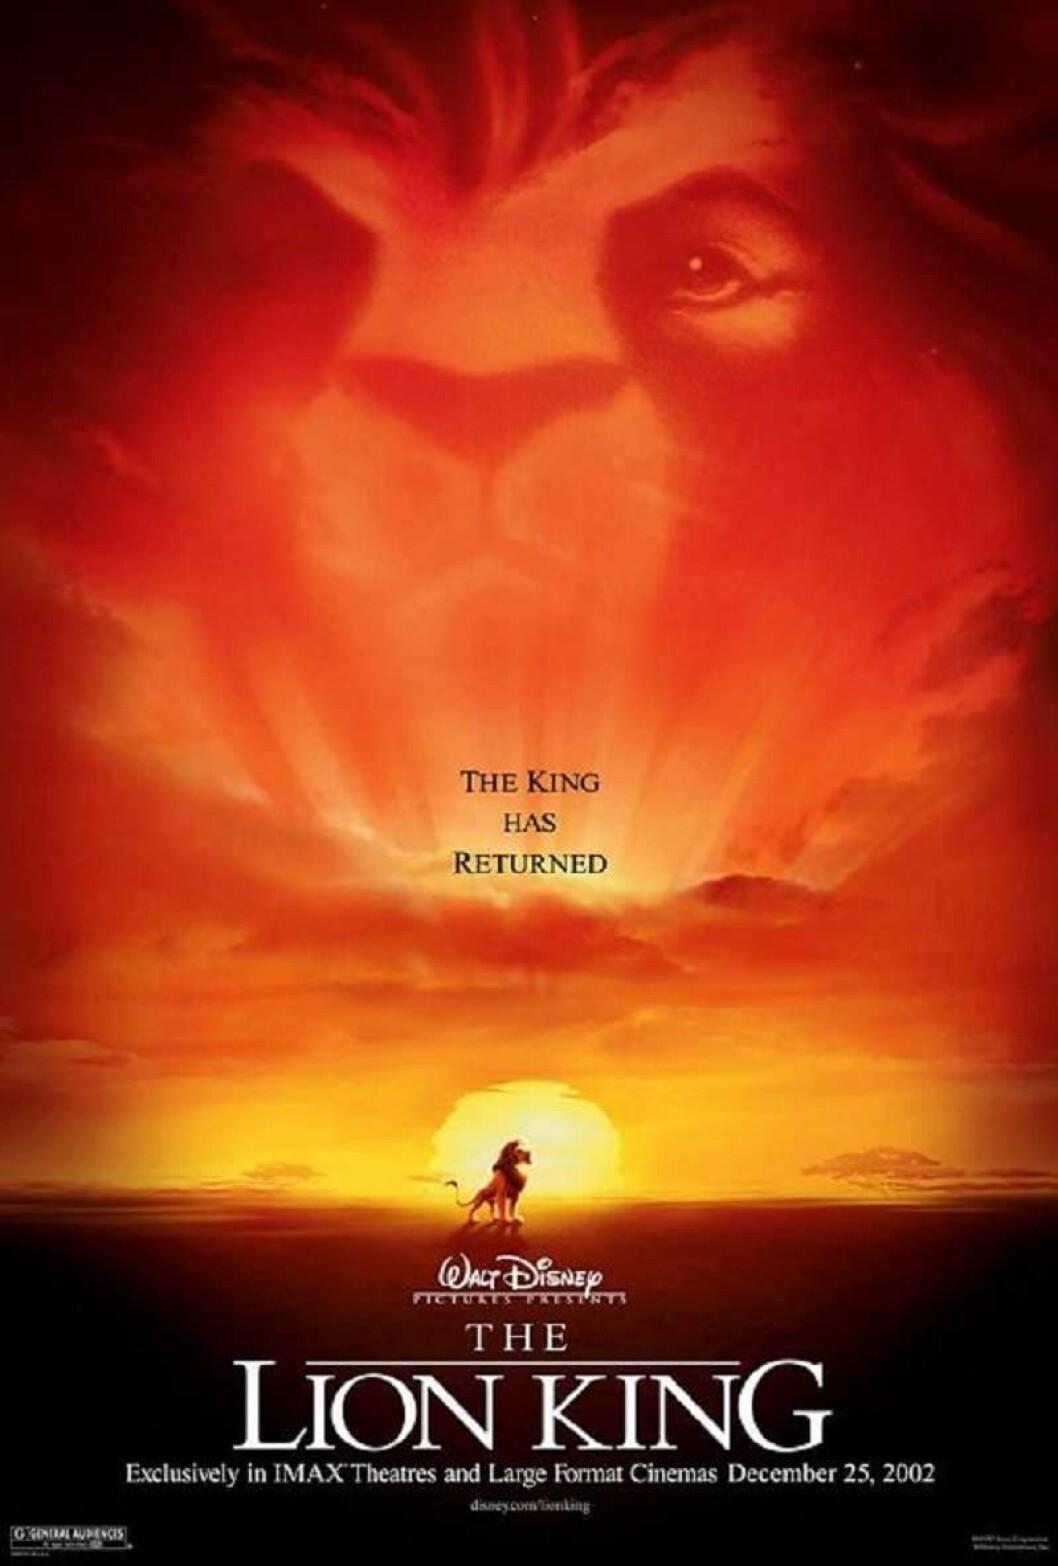 en solnedgång med ett lejon i himlen